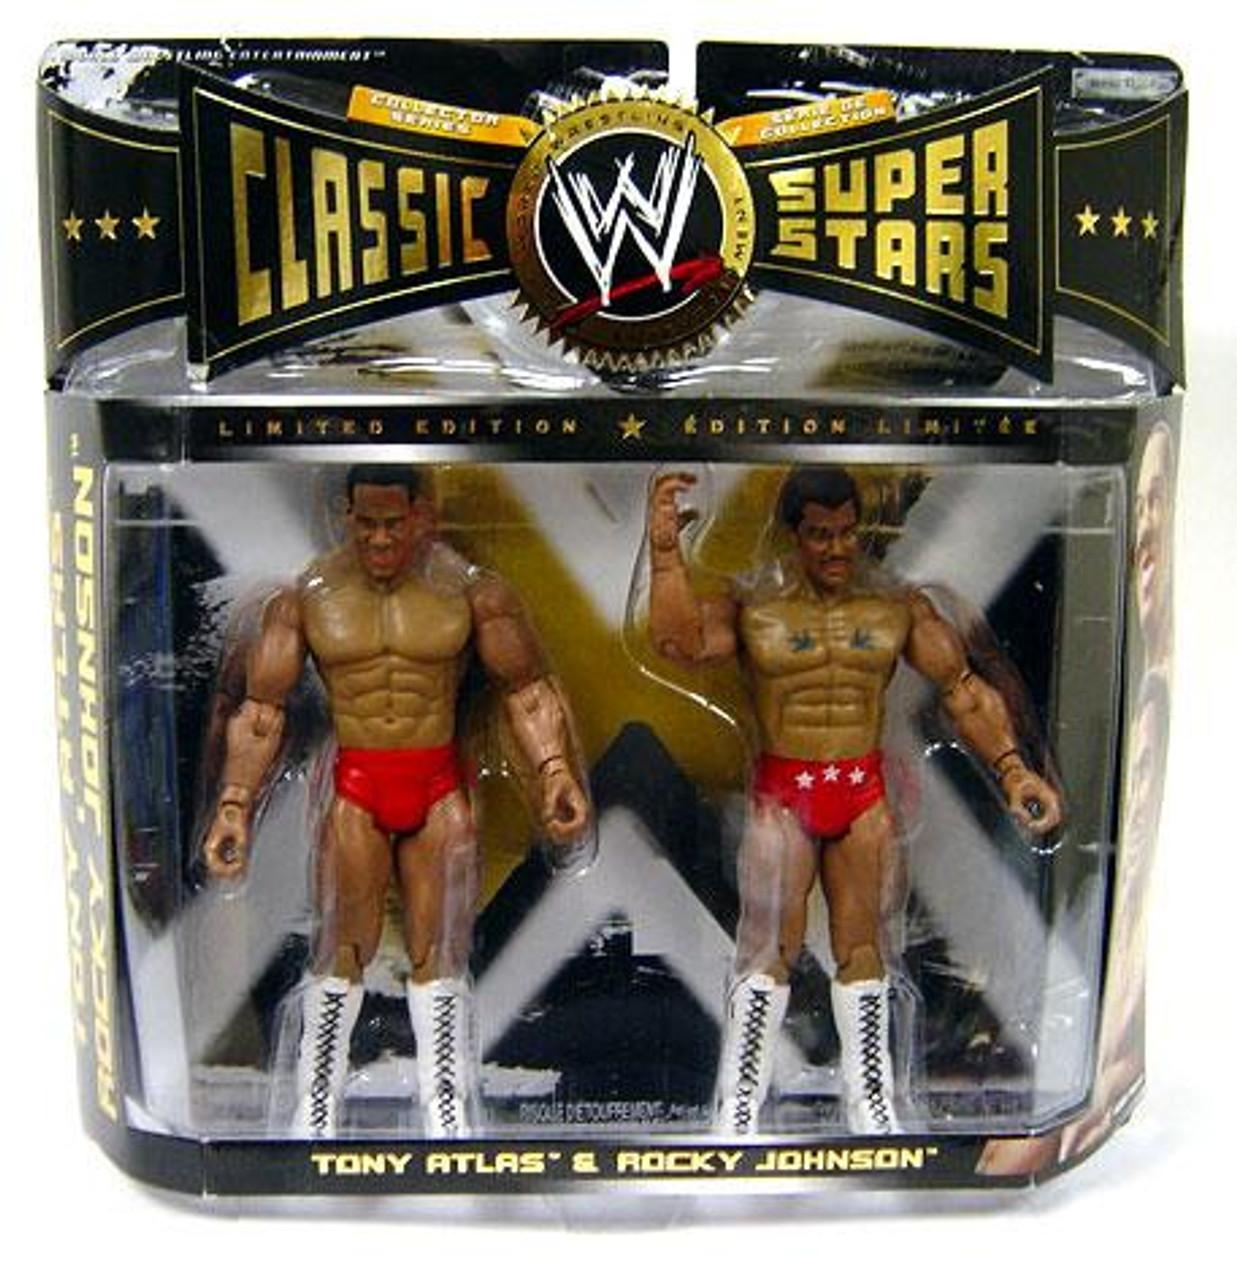 WWE Wrestling Classic Superstars Tony Atlas & Rocky Johnson Action Figure 2-Pack